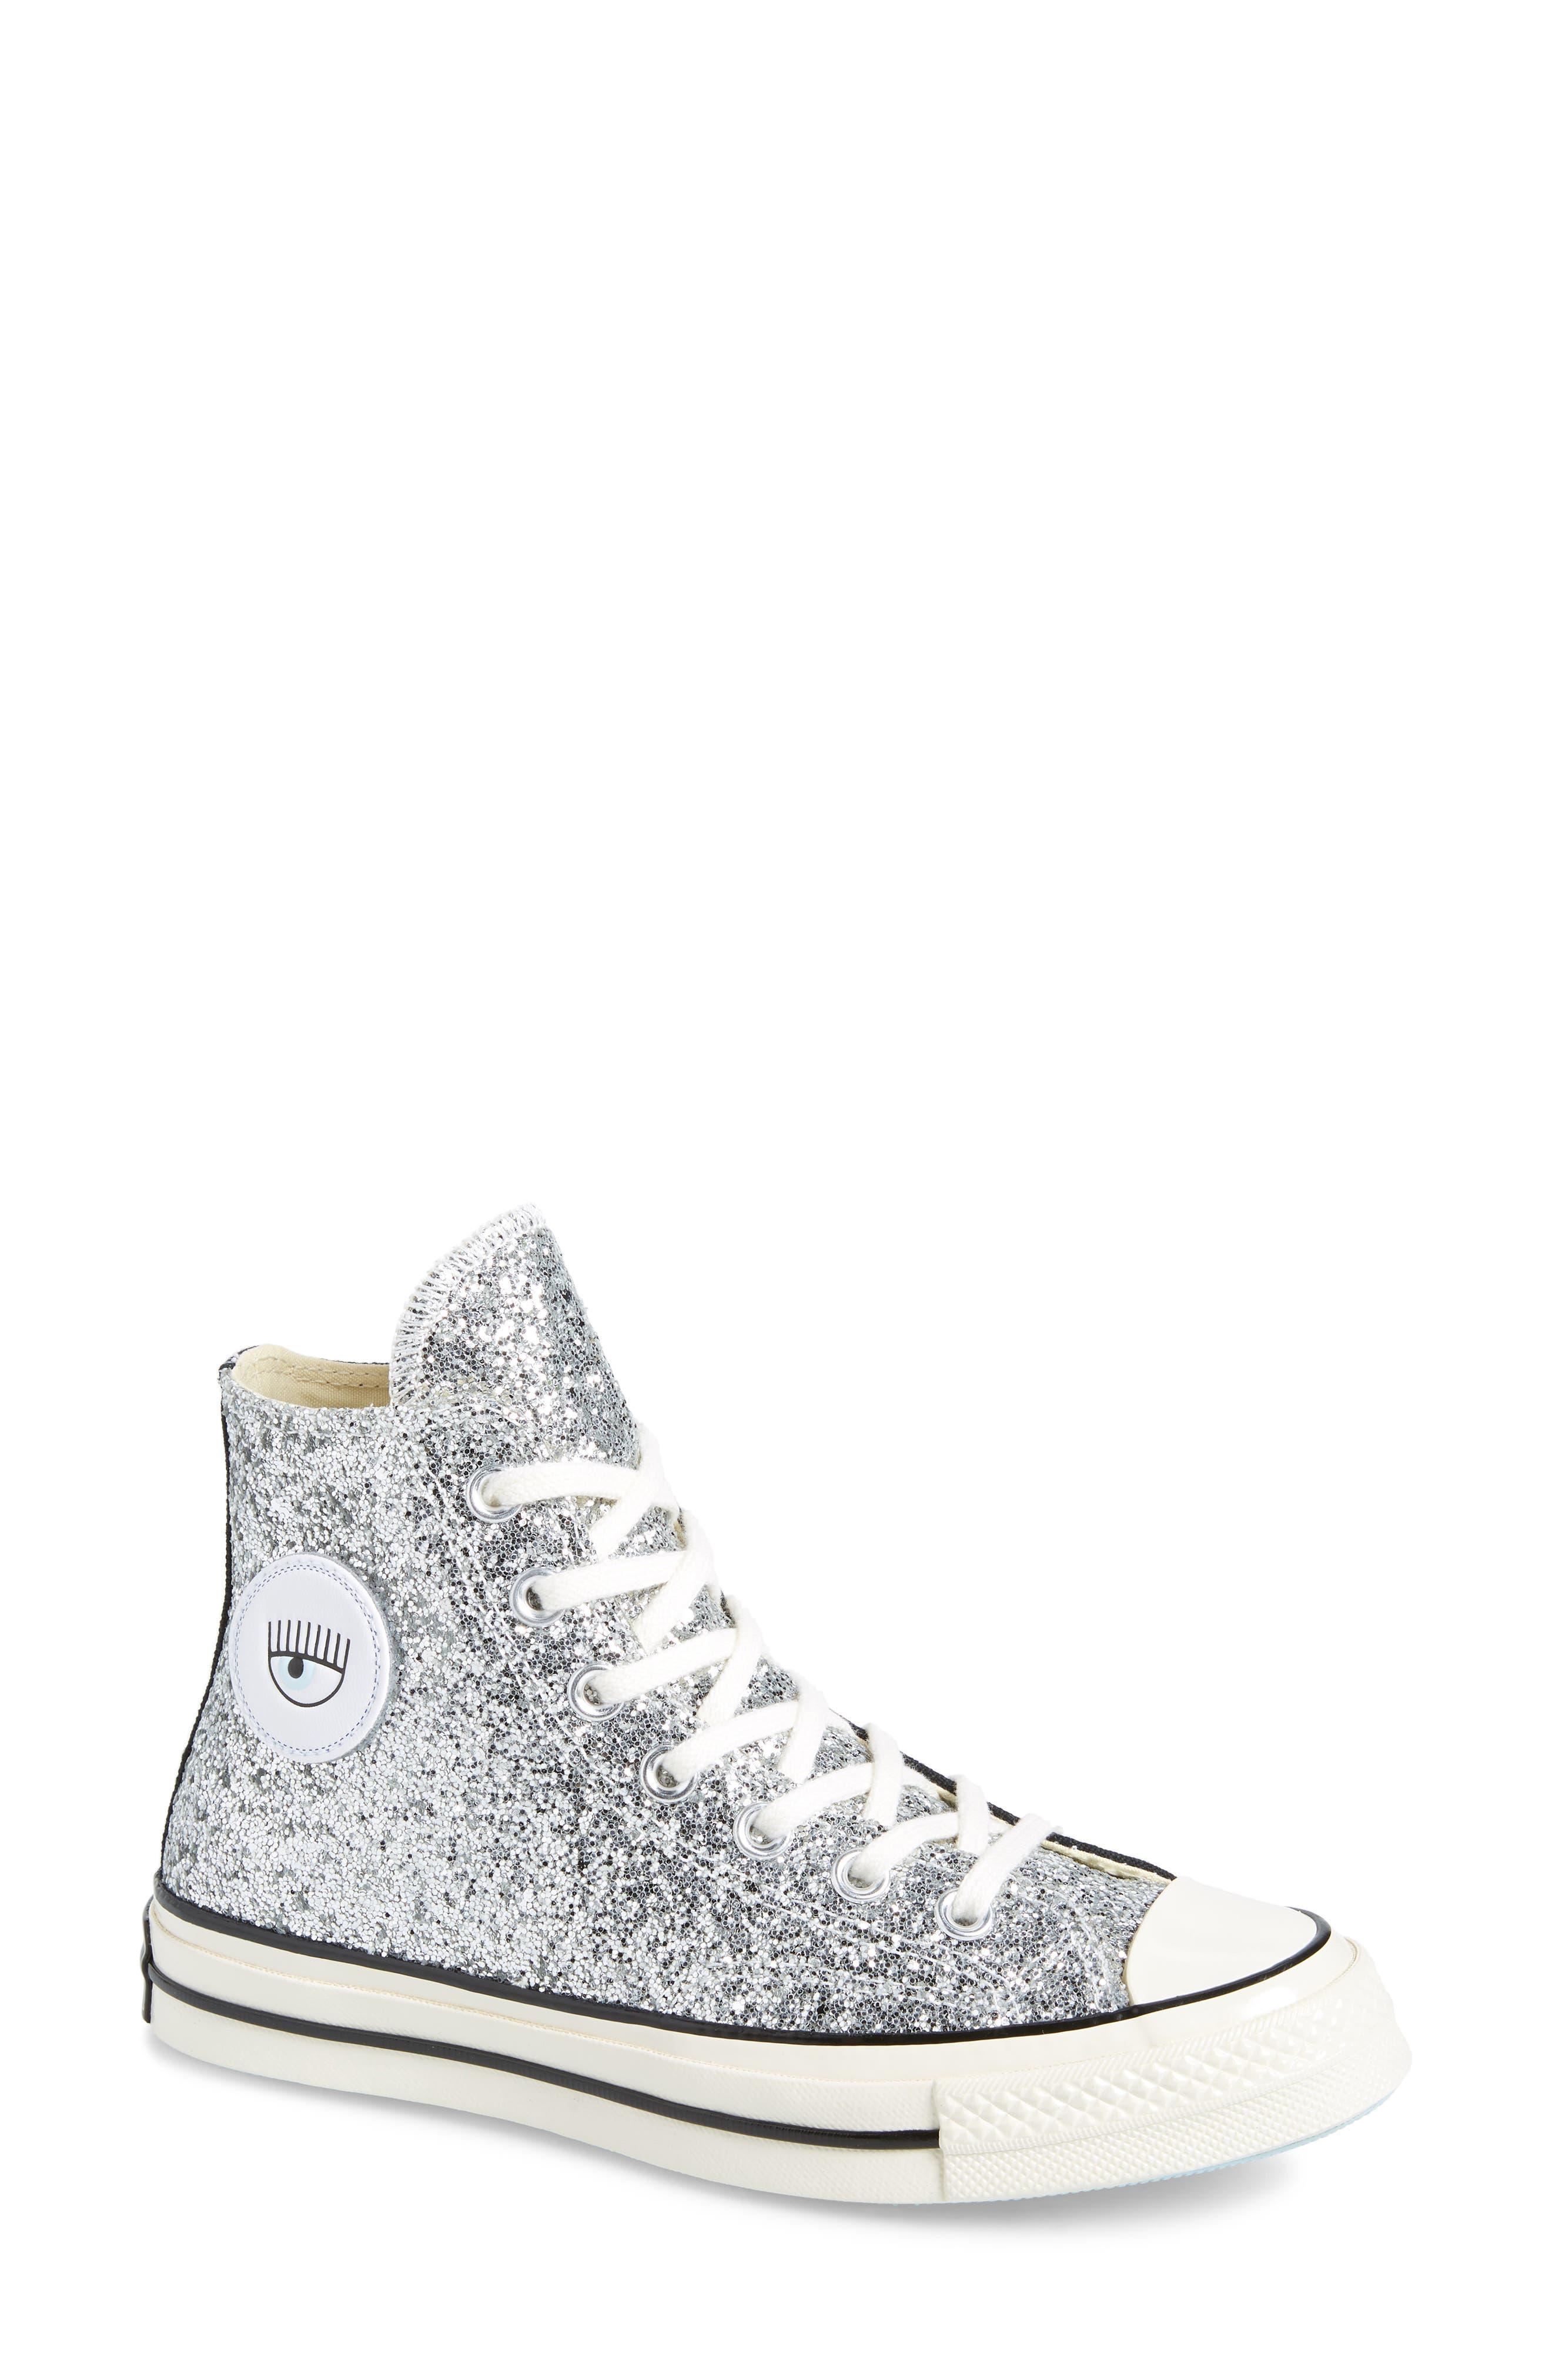 X Chiara Ferragni Women'S Chuck Taylor Tillands Glitter High Top Sneakers in Black/ Metallic Silver